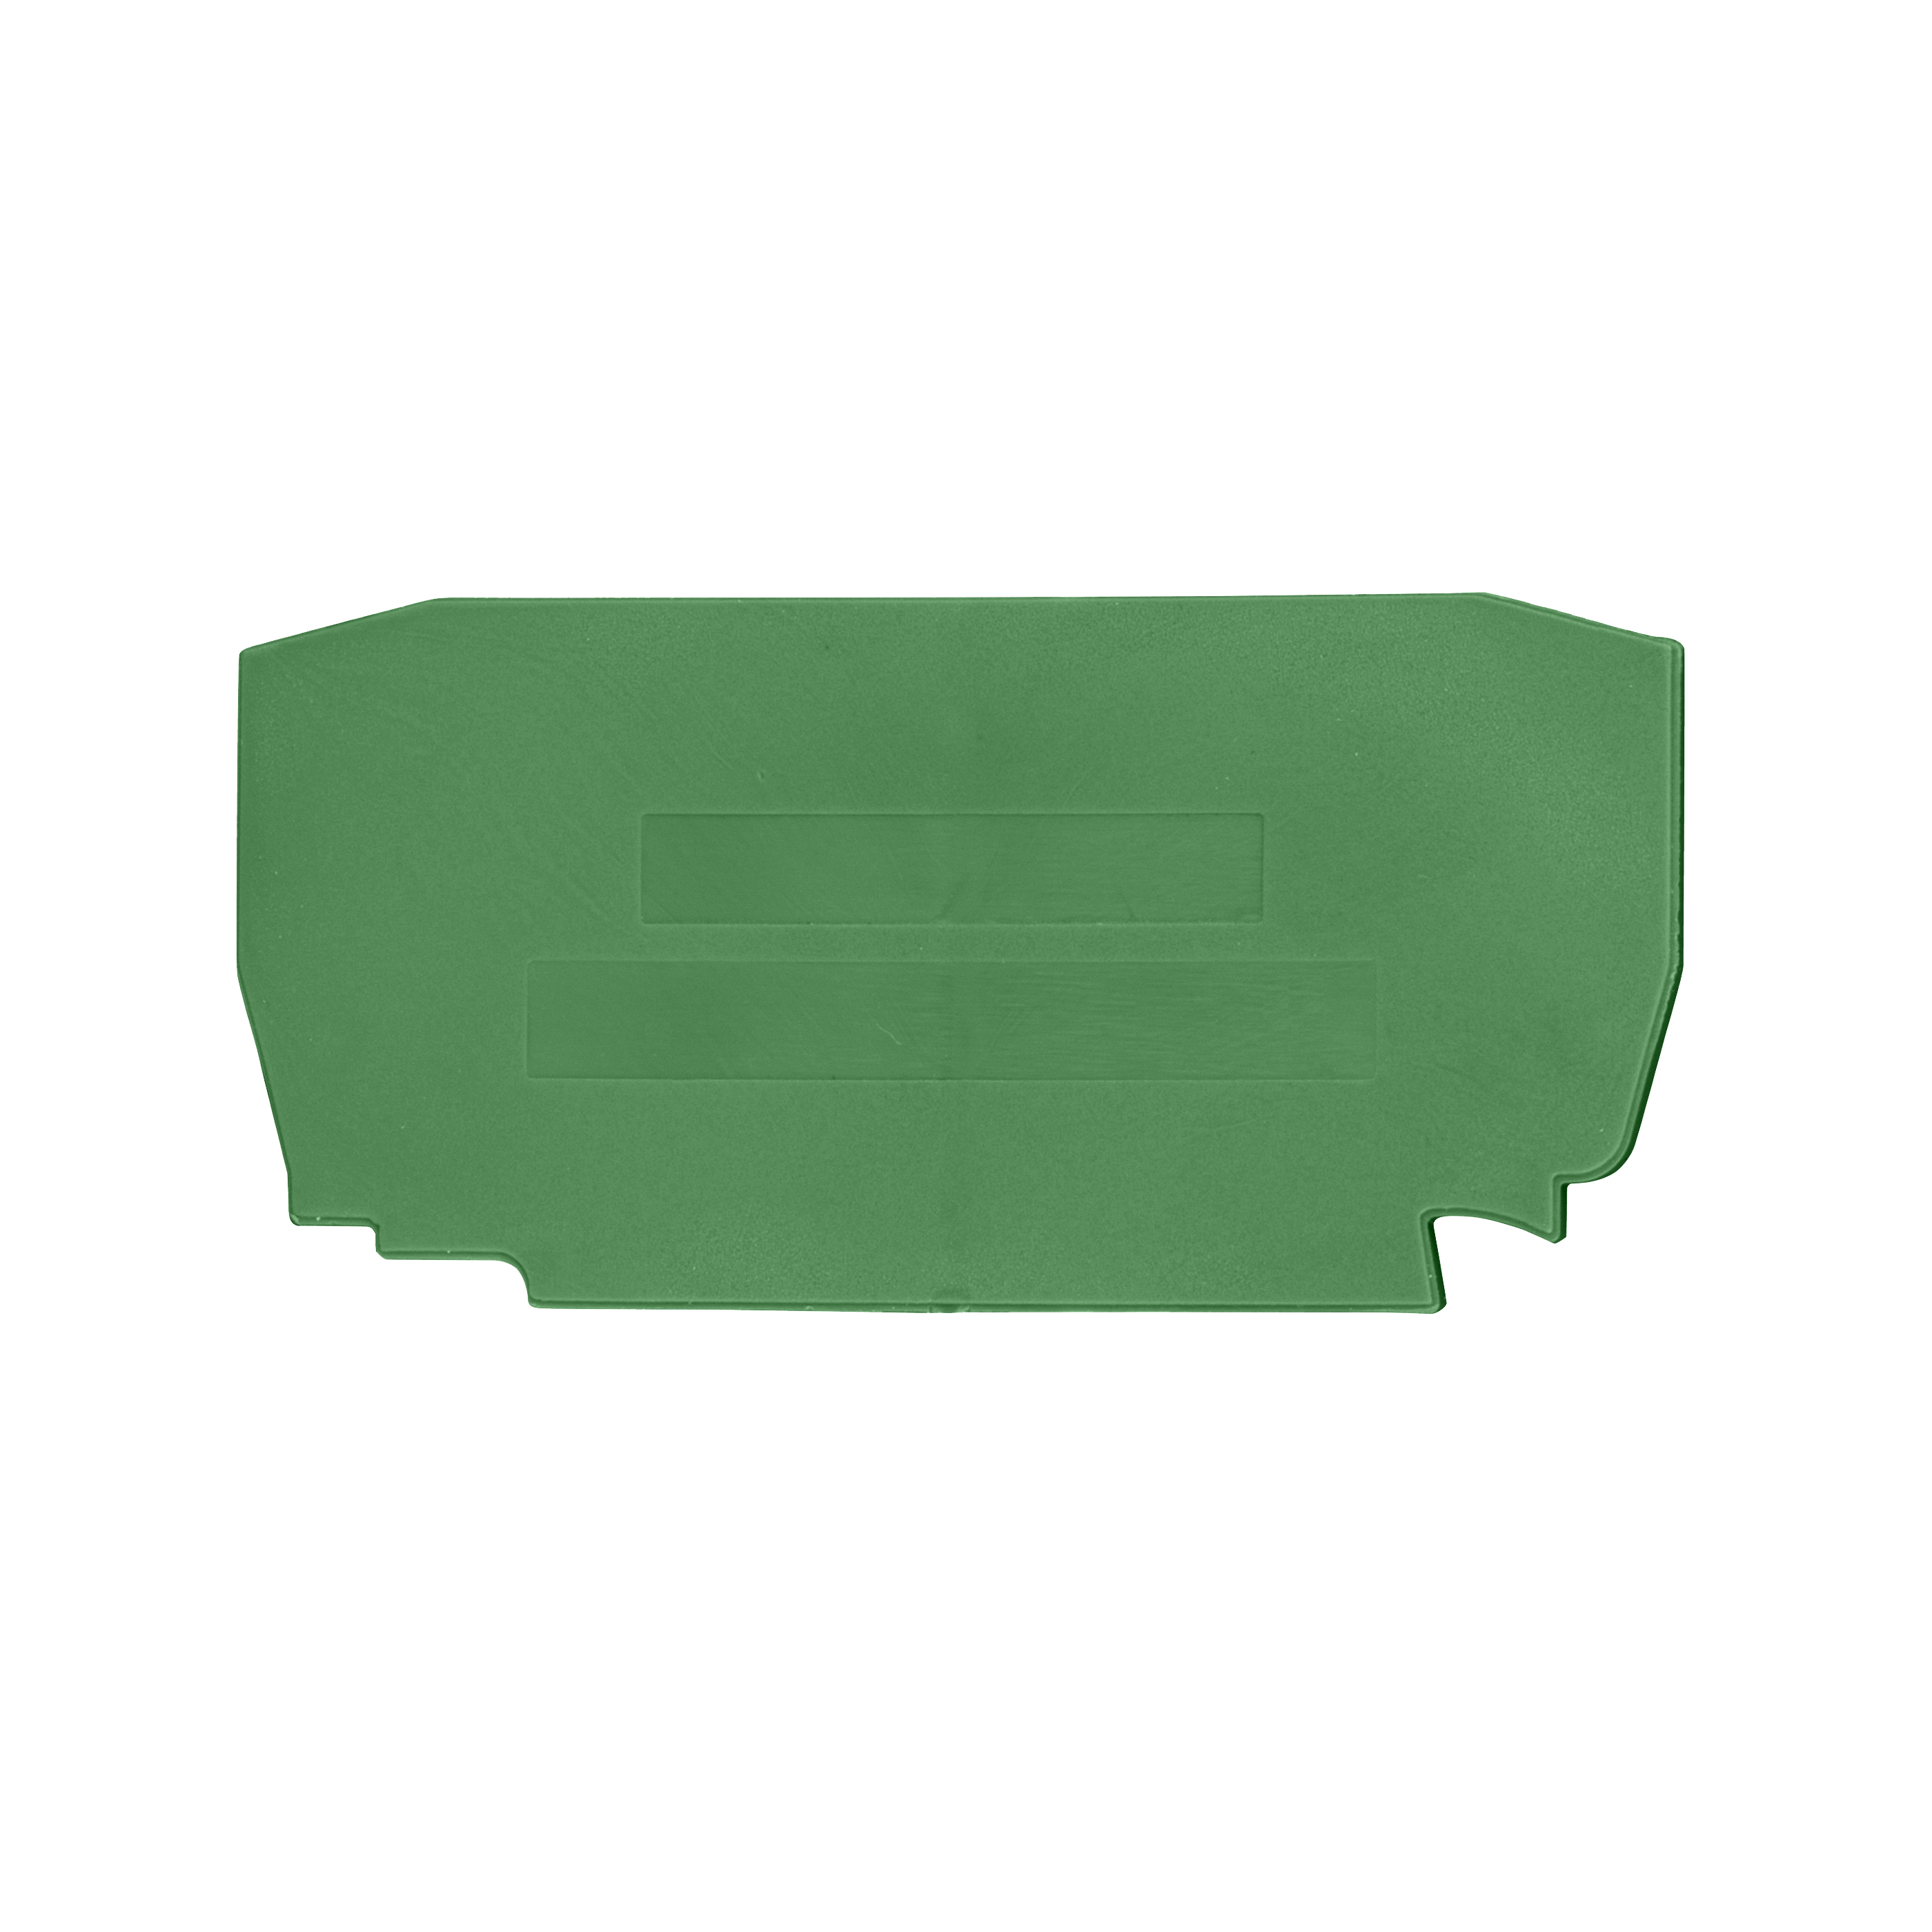 1 Stk Endplatte für Federkraftklemme YBK 2.5 T grün IK632202--